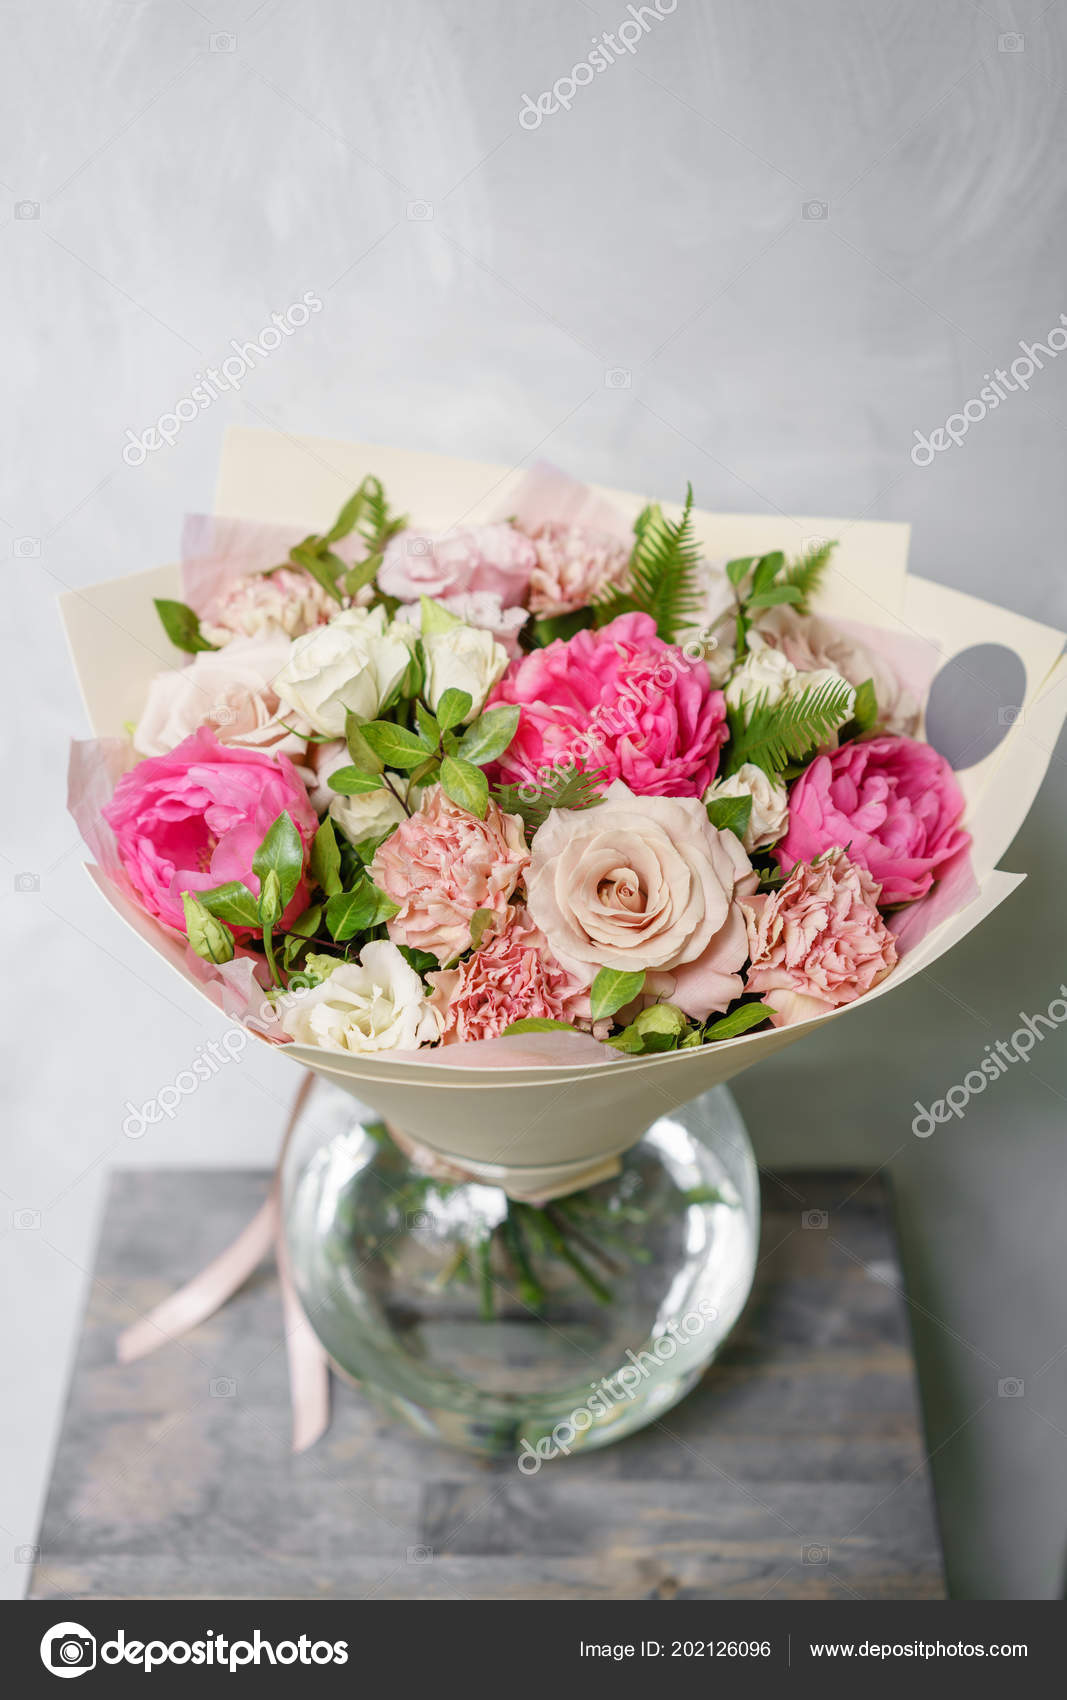 Beautiful summer bouquet flower arrangement with peonies color beautiful spring bouquet flower arrangement with hydrangea and peonies color light pink the concept of a flower shop a small family business mightylinksfo